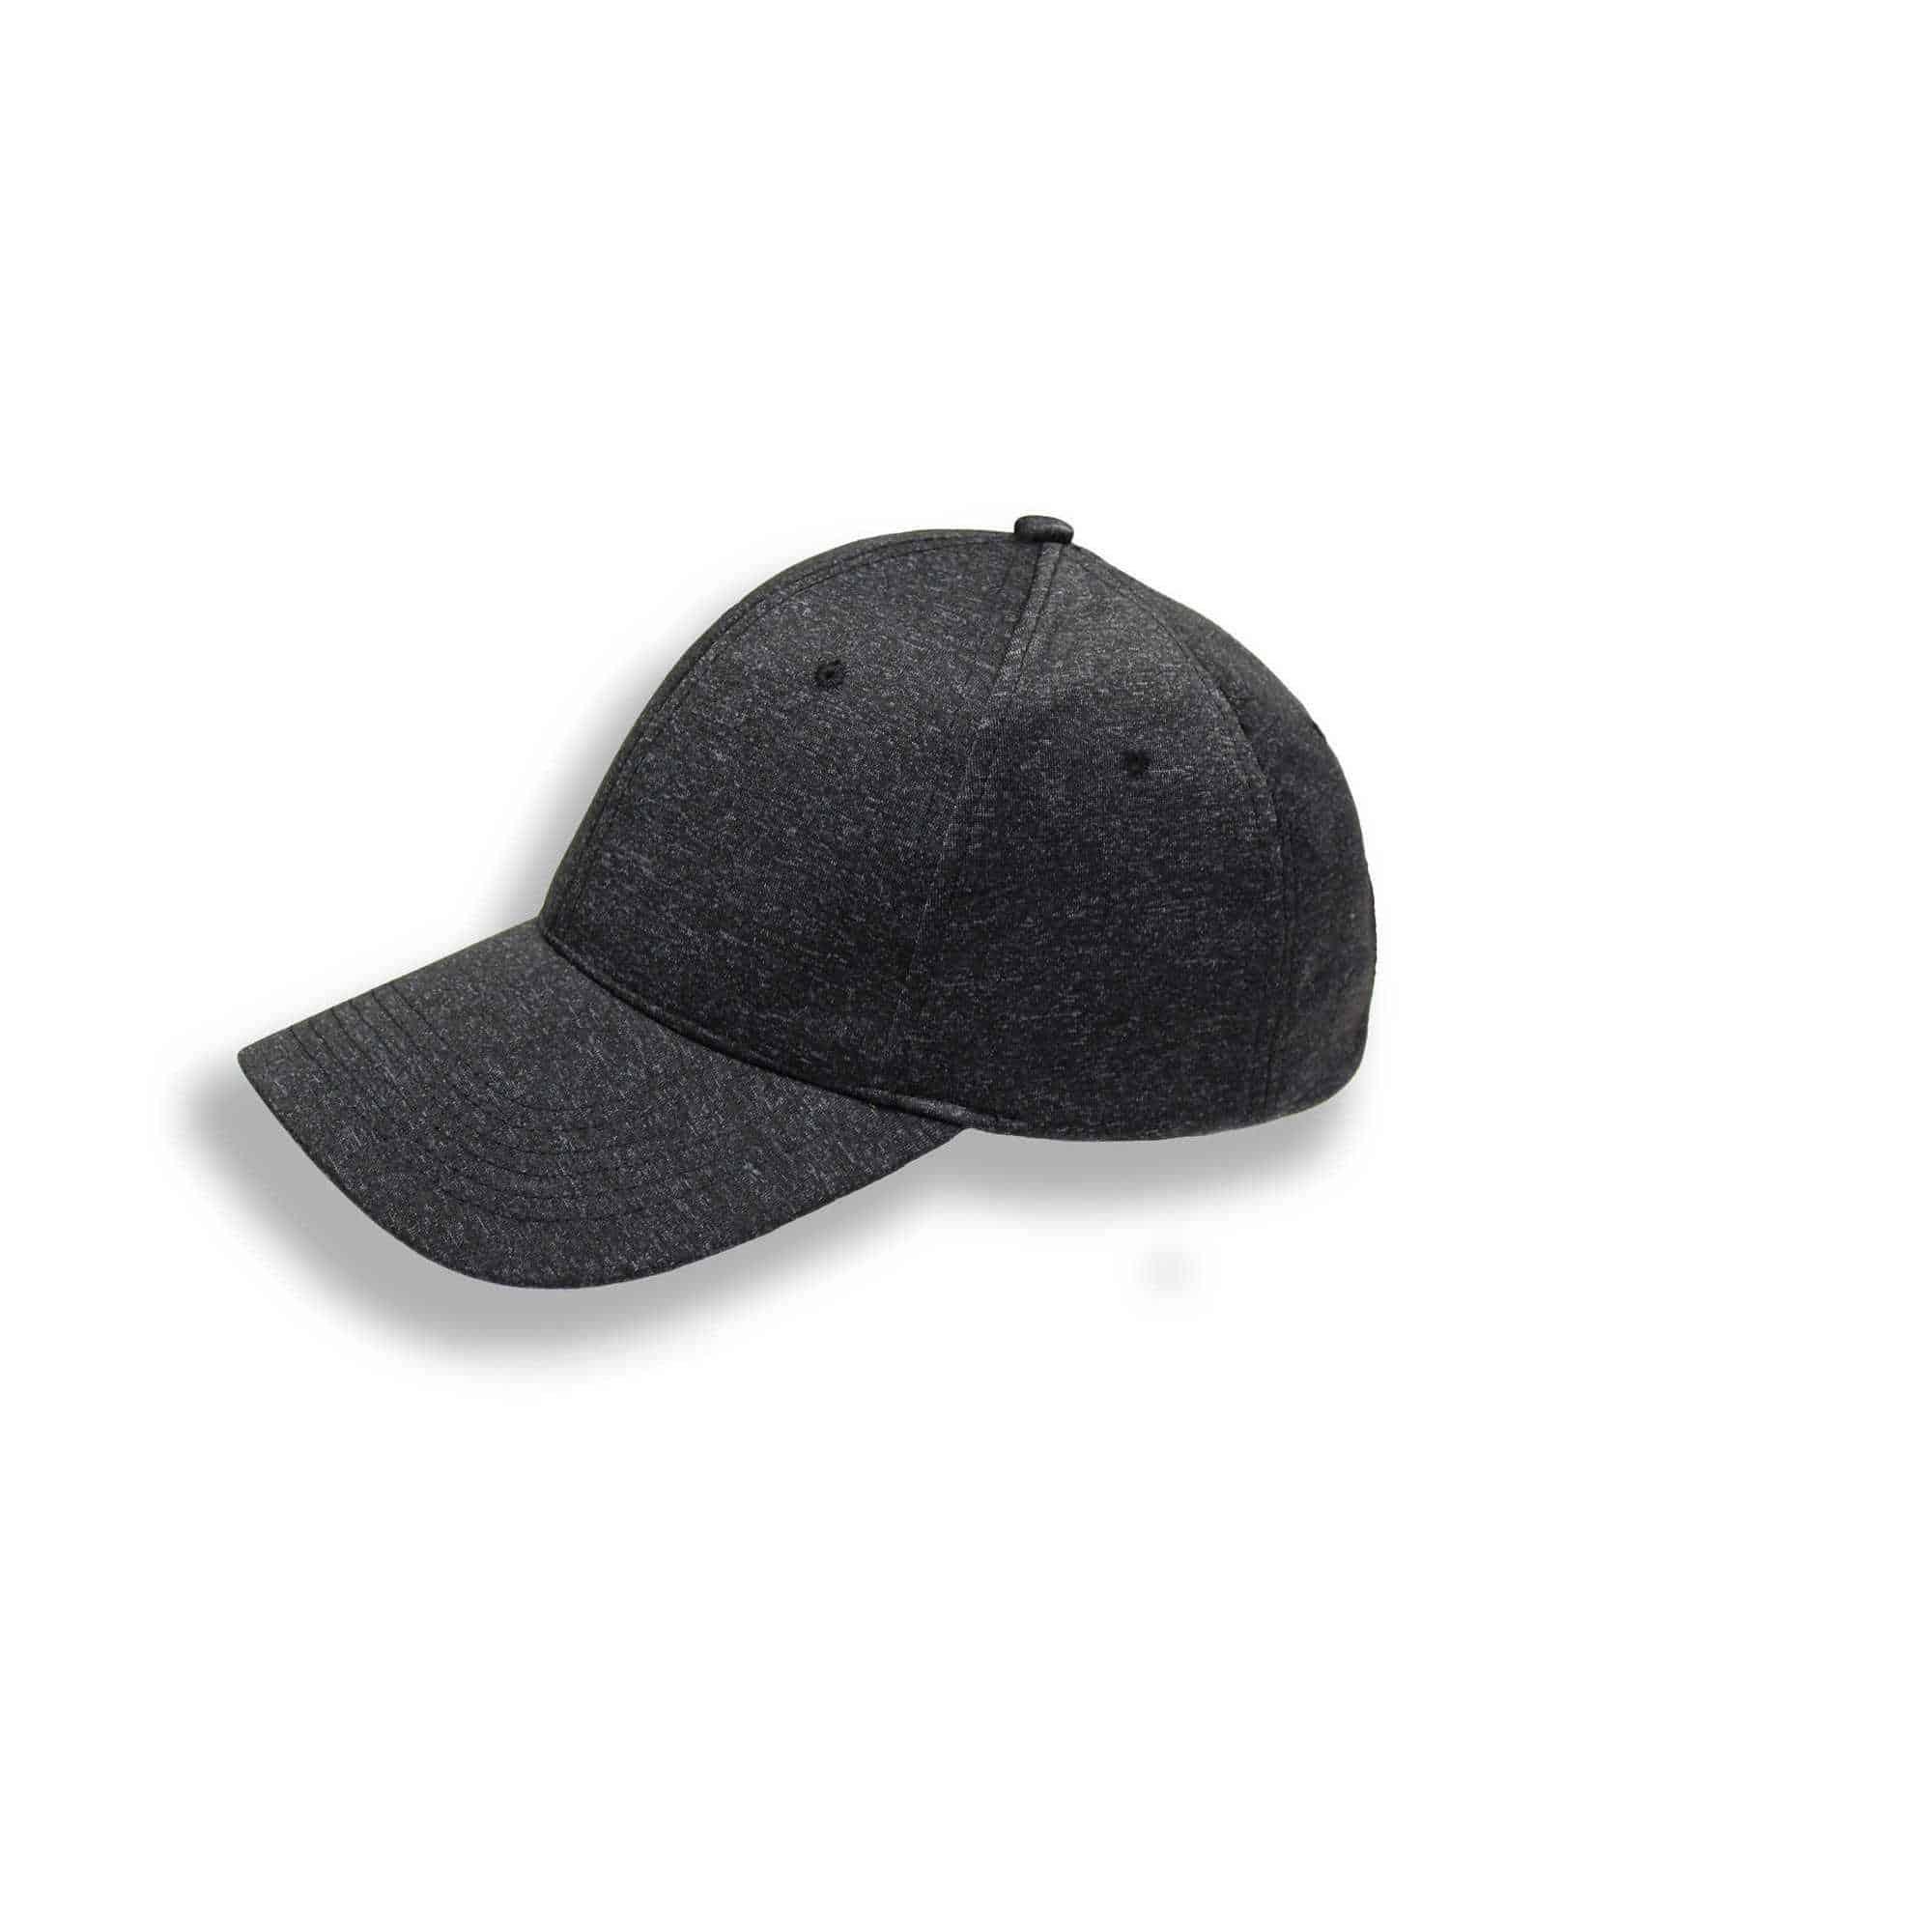 Velcro Enclosure 6 Panel Curved Peak Jersey Melange Headwear and Accessories